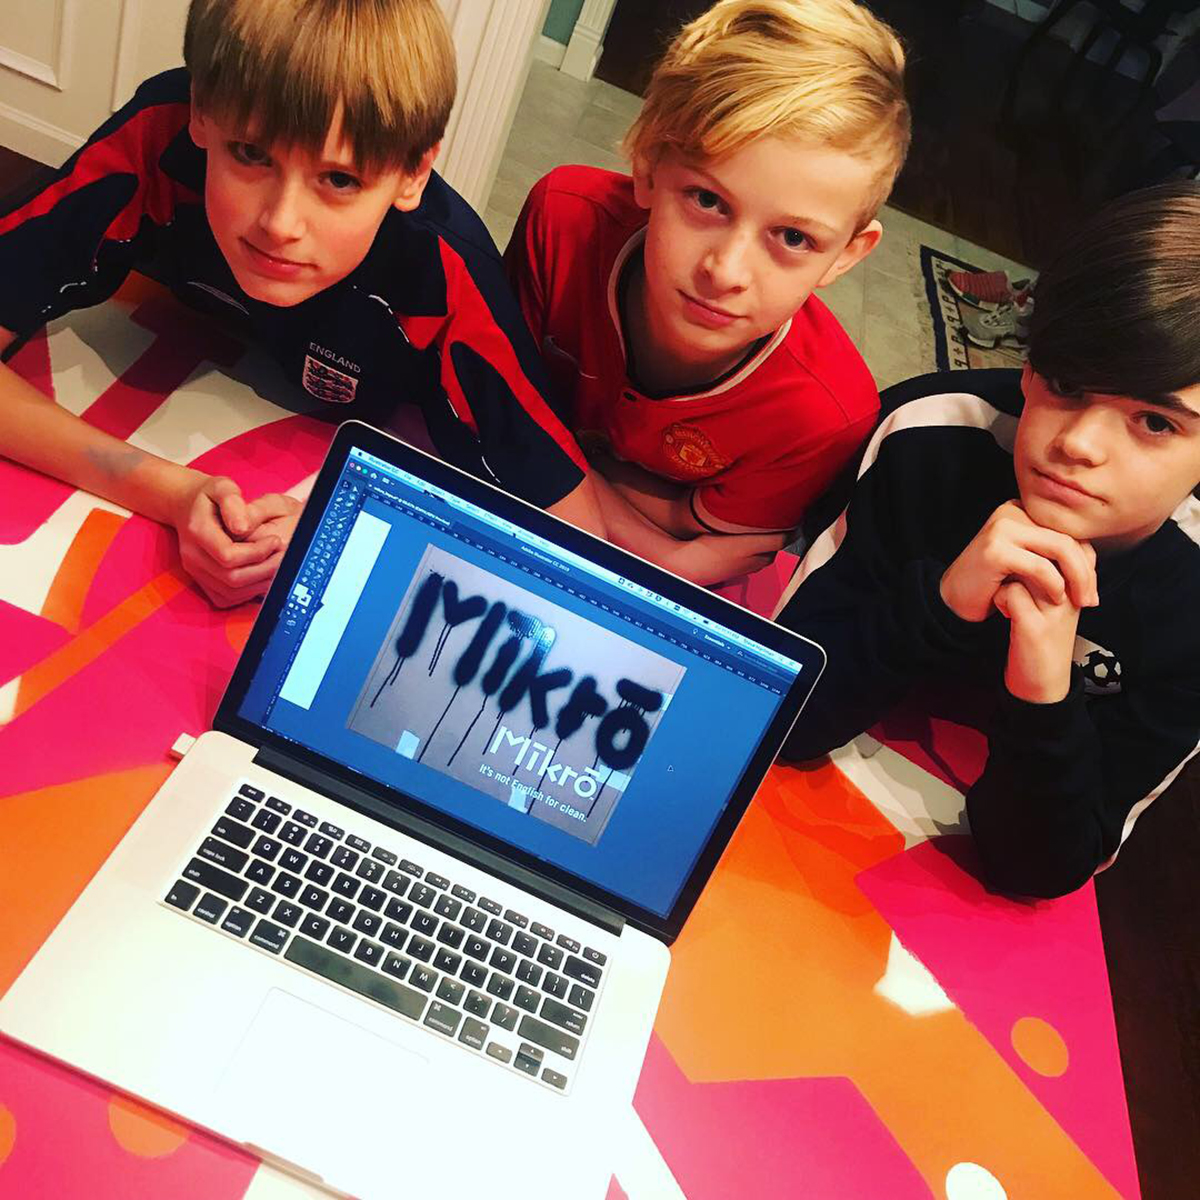 Noah. Connor. Cameron. Three teens with an idea.